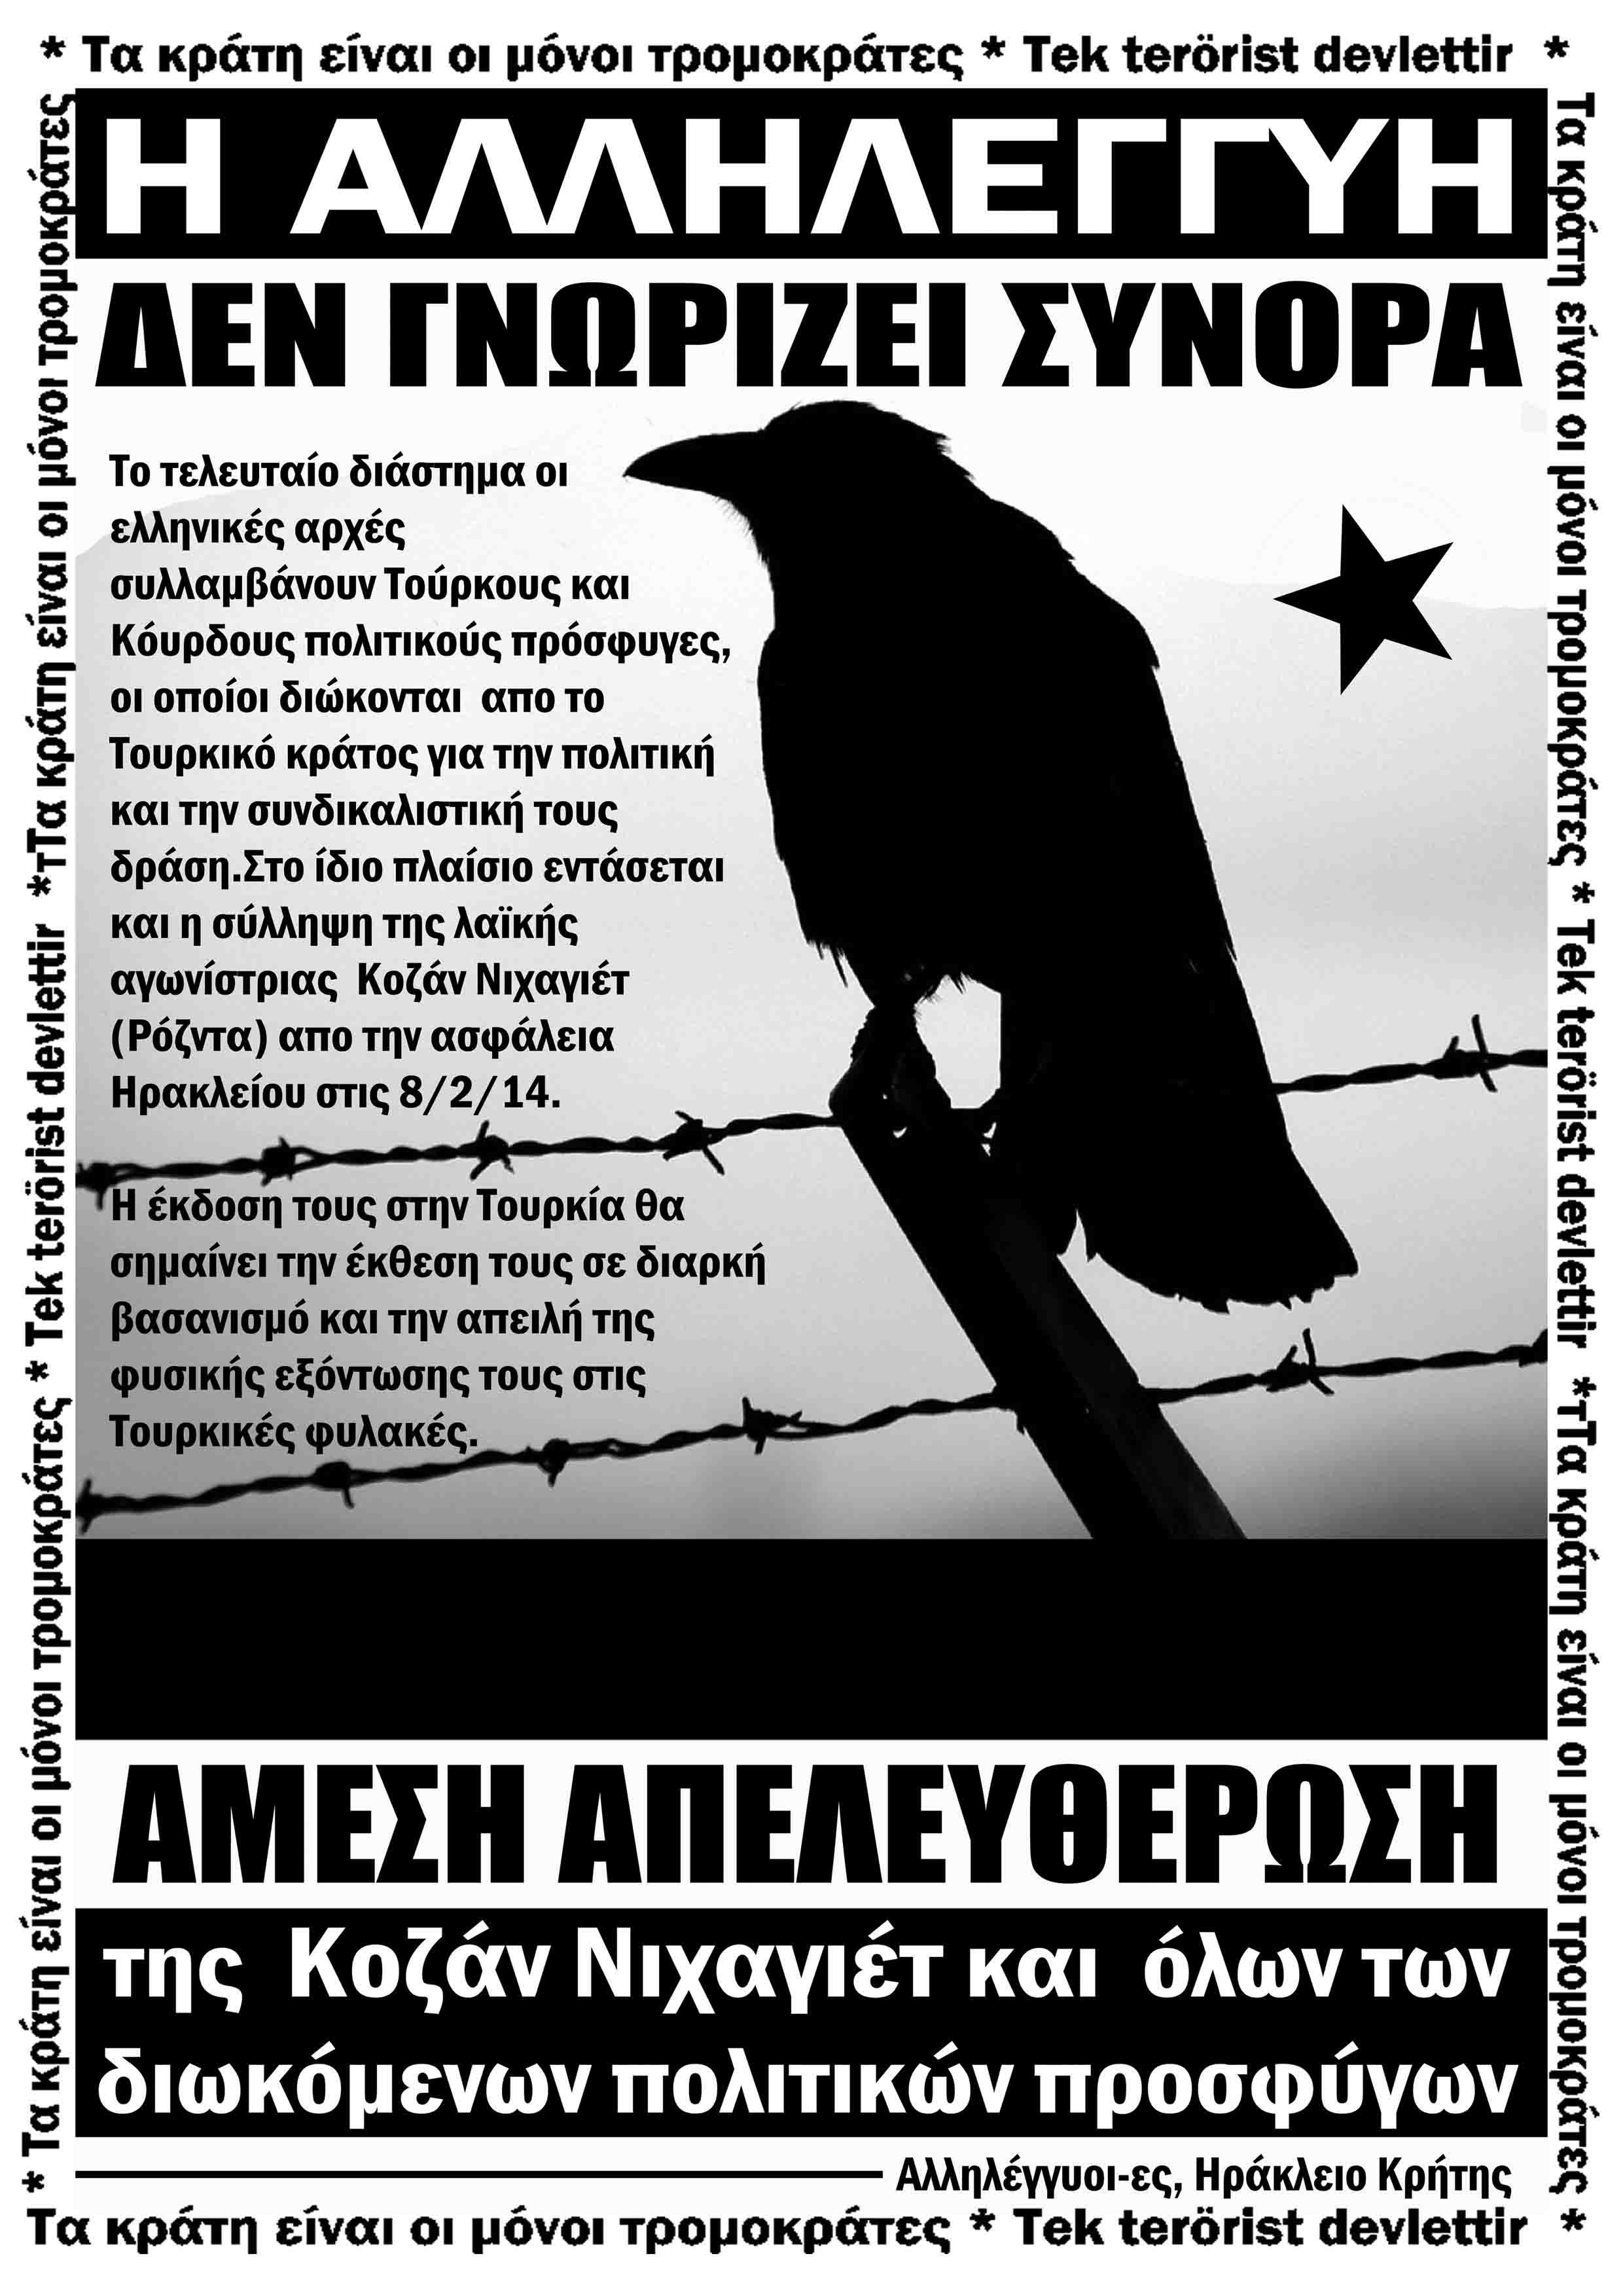 solidarity-kozan-Nihagiet